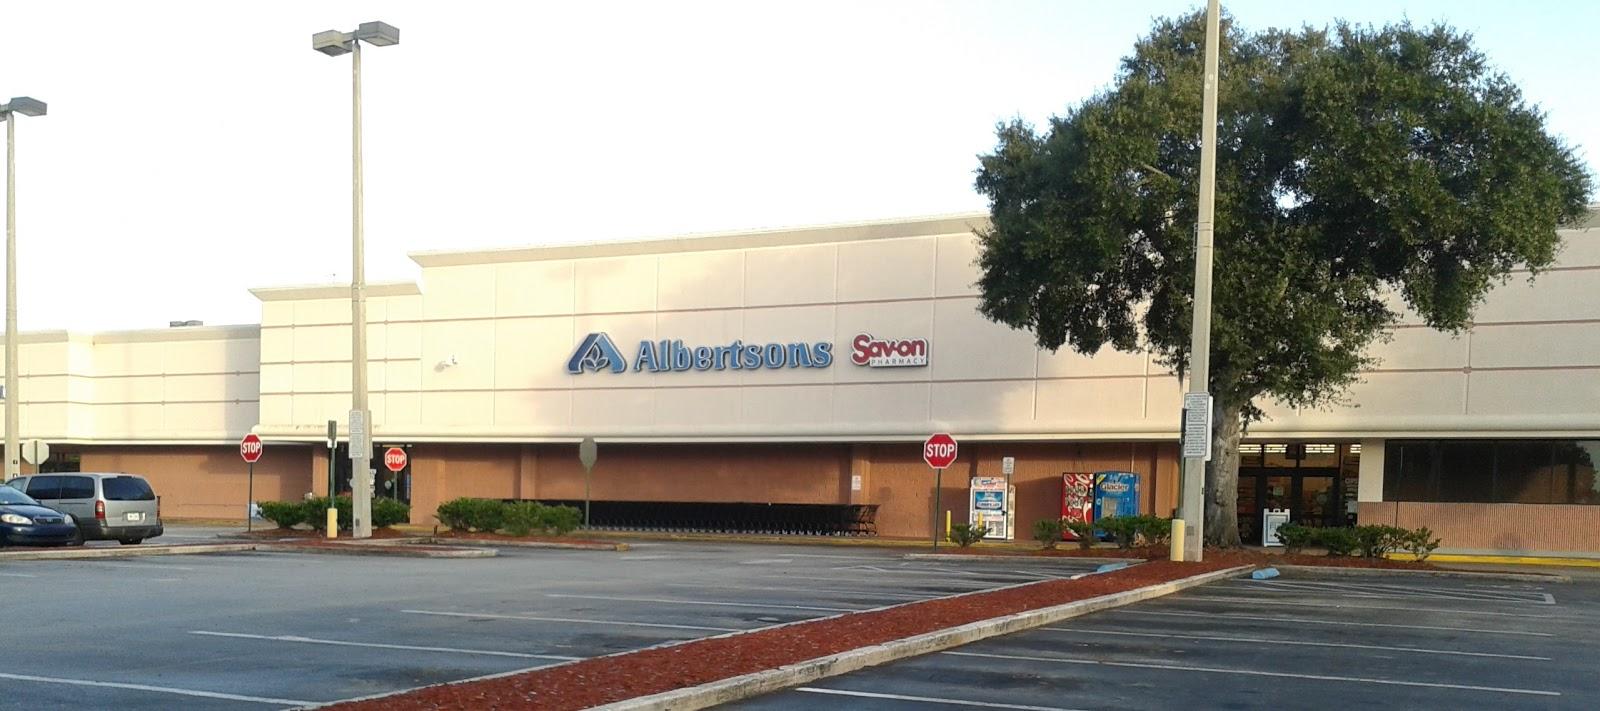 Albertsons Florida Blog: Albertsons Florida Remodel Updates ...